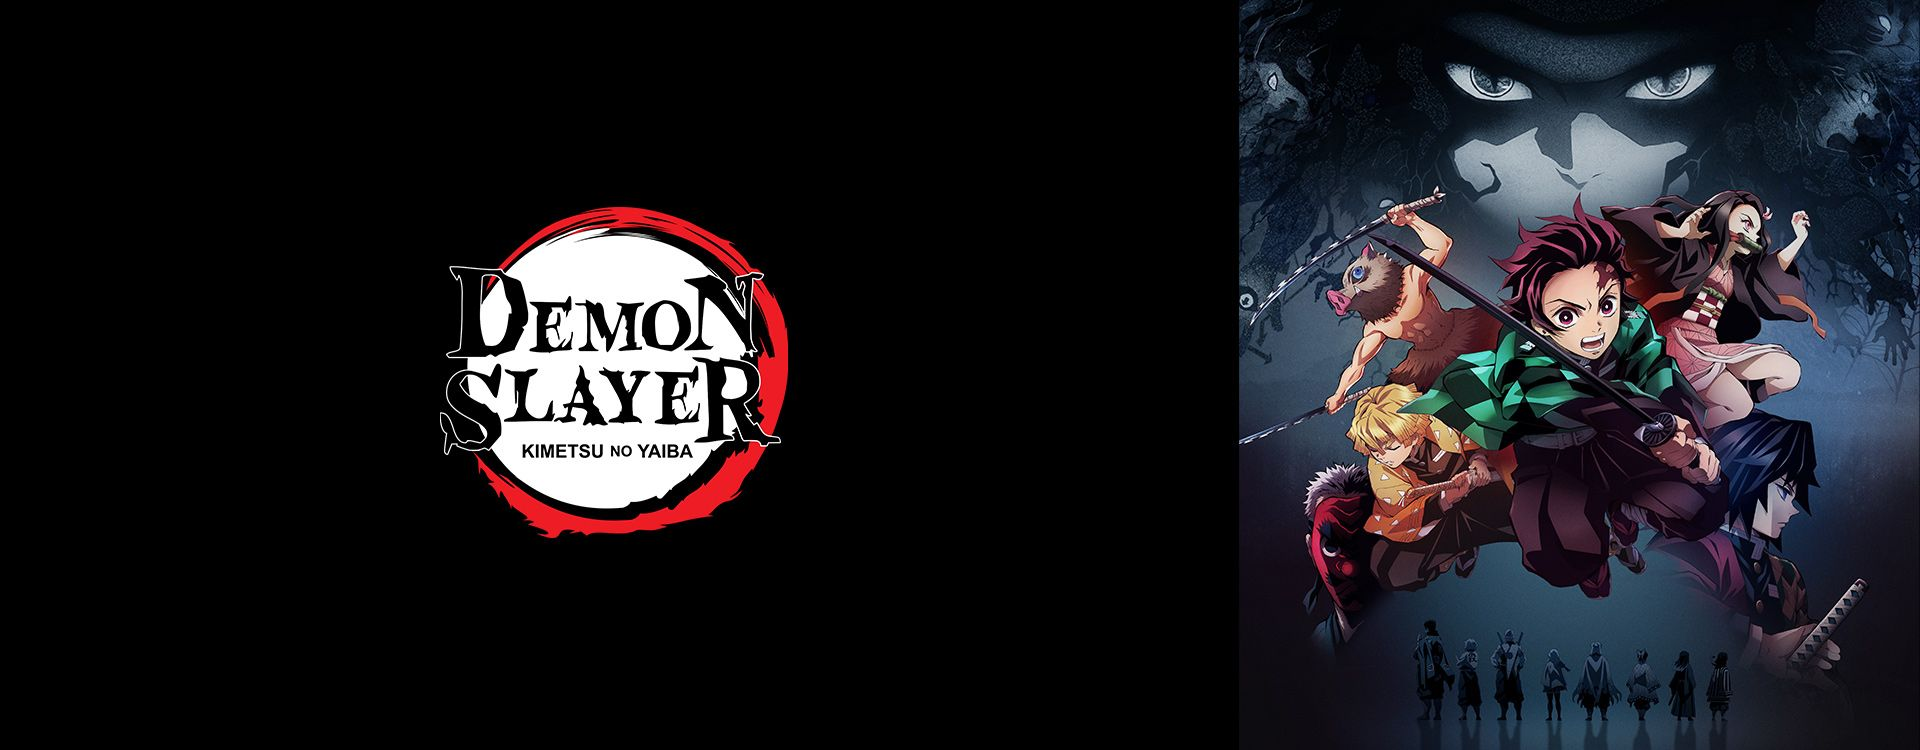 Demon Slayer Logo Wallpapers - Top Free Demon Slayer Logo ...